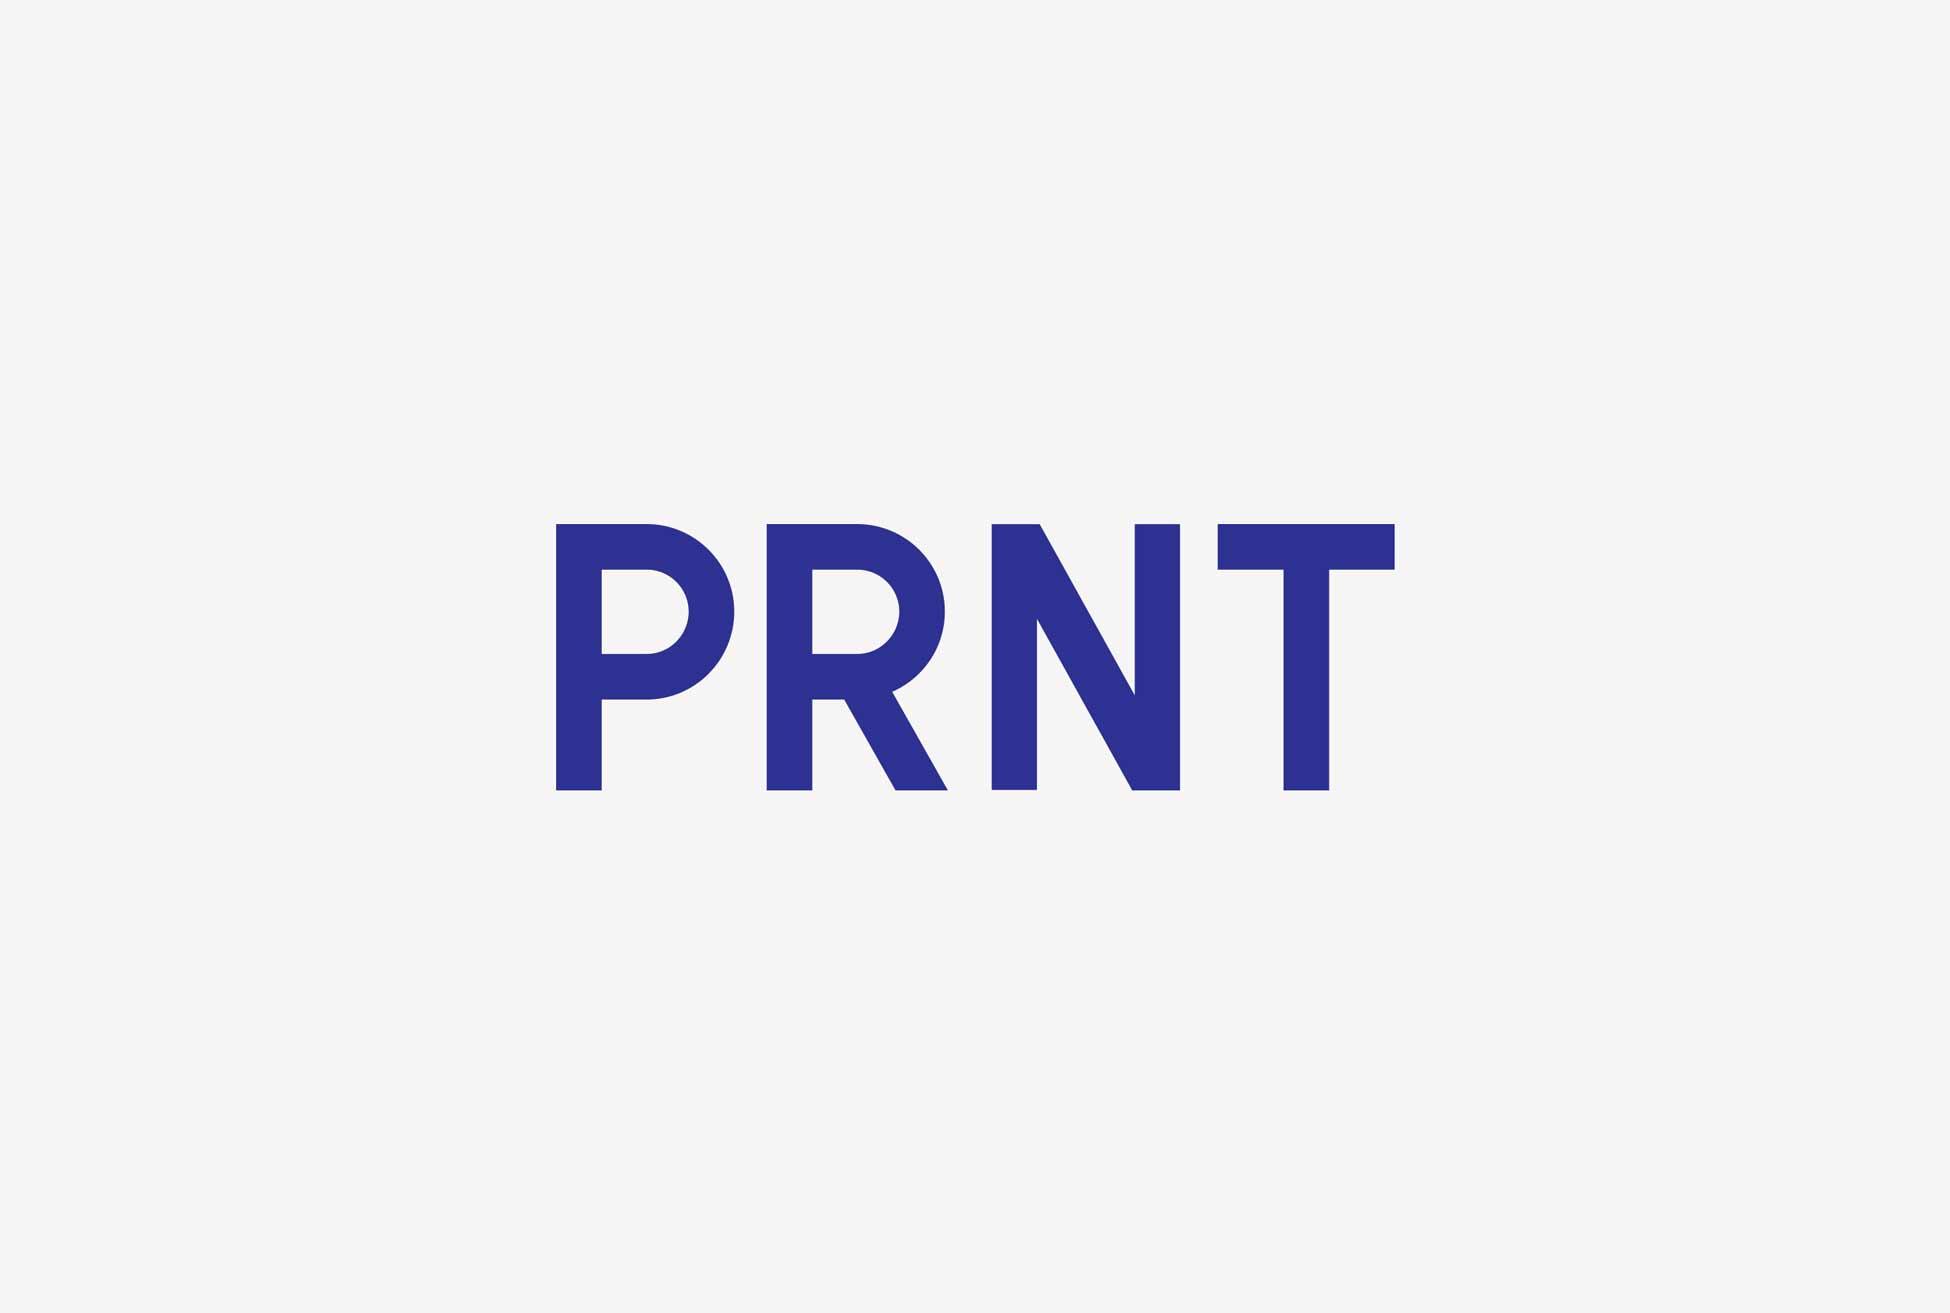 PRNT_primary-logotype.jpg